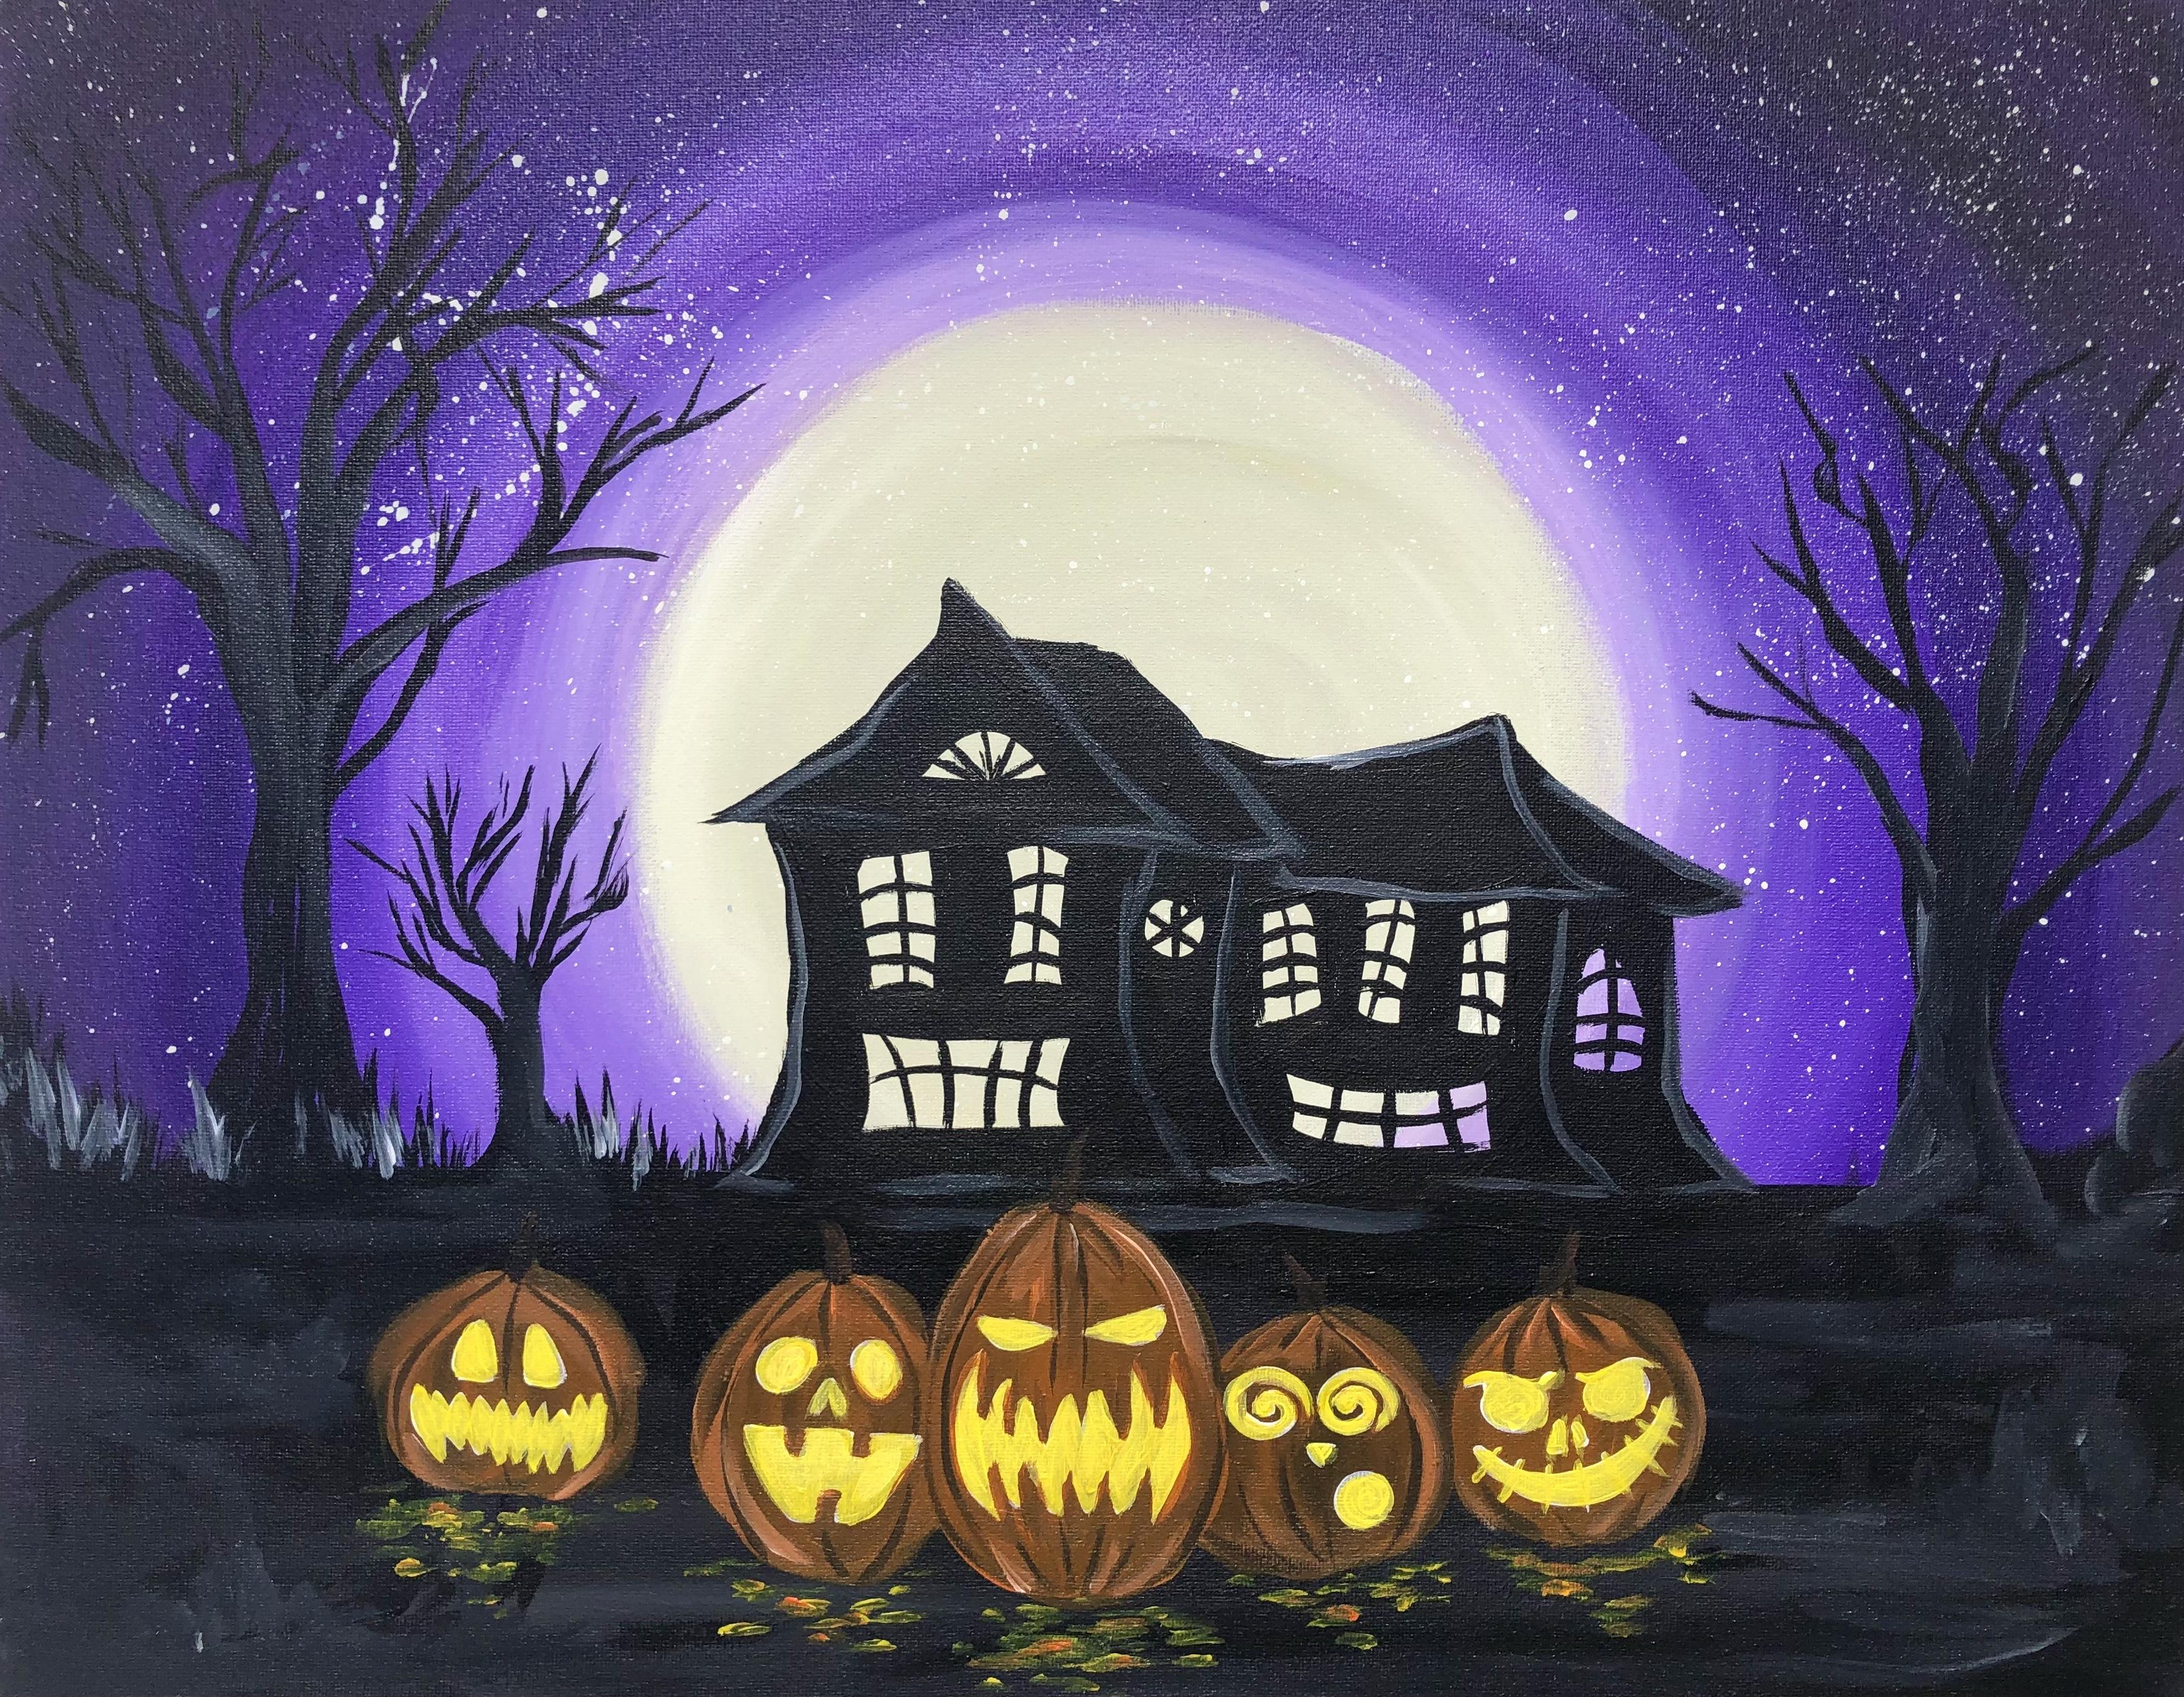 'Haunted House'